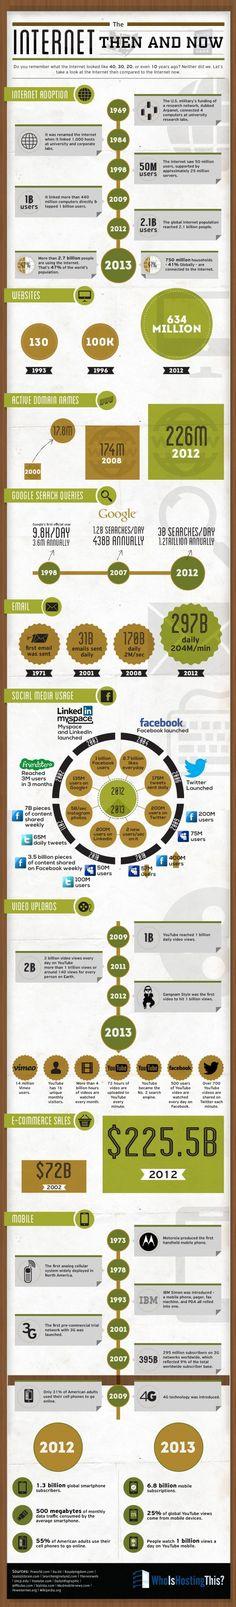 Internet desde su nacimiento a la actualidad - #historia #infografia / The Internet then and now - #infographic